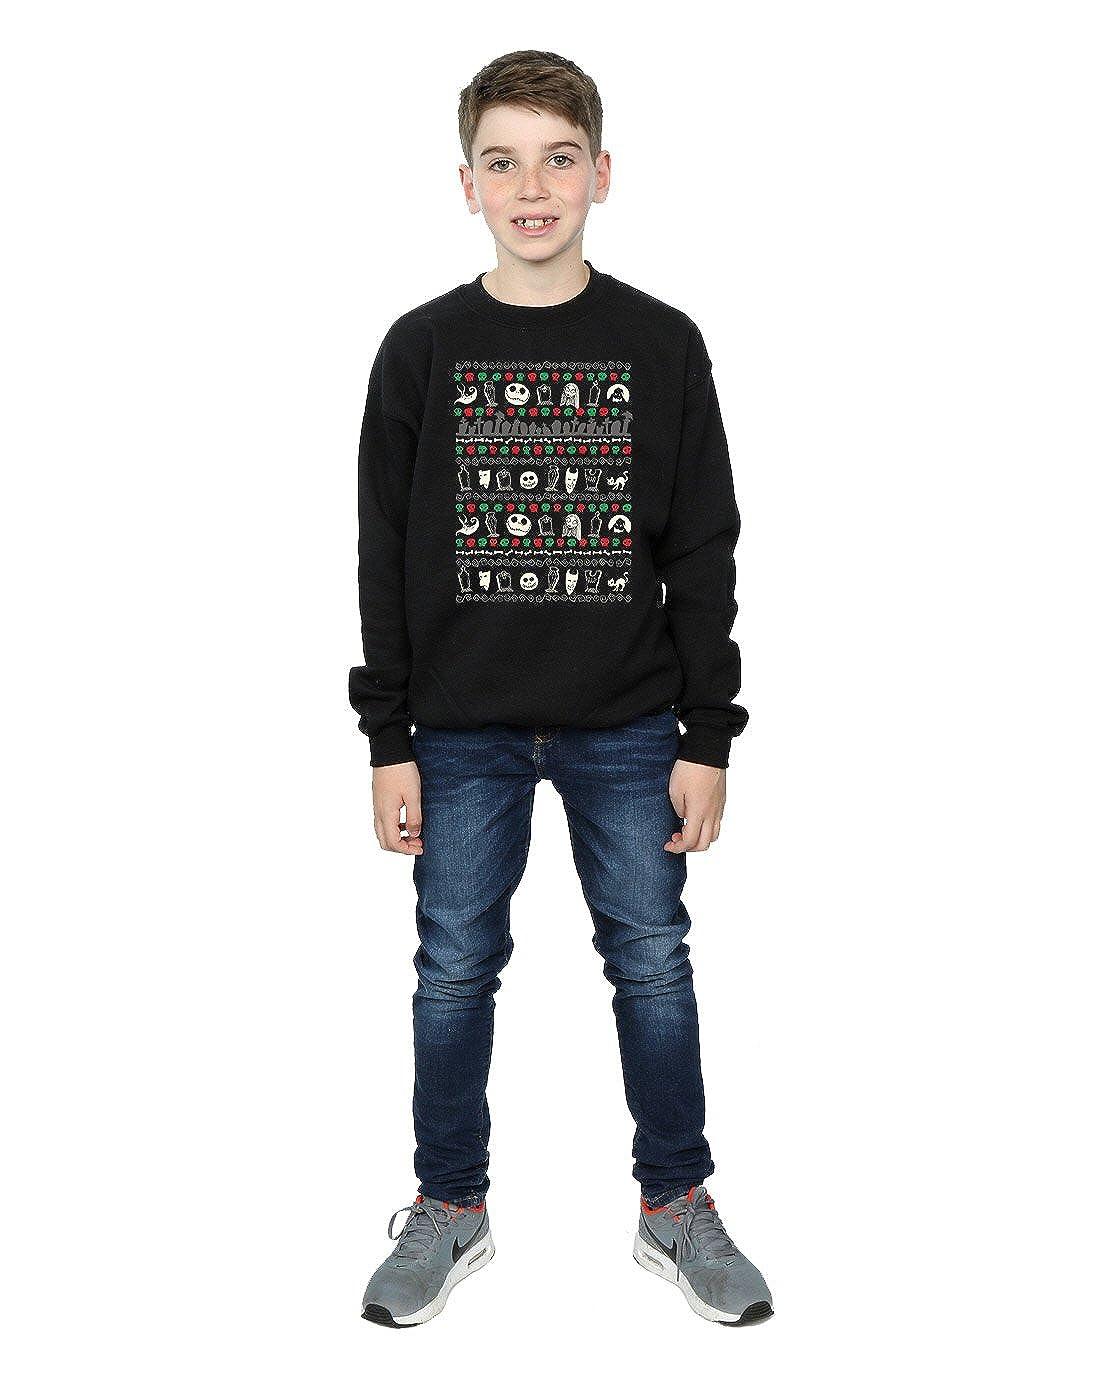 Disney Boys Nightmare Before Christmas Festive Icons Sweatshirt